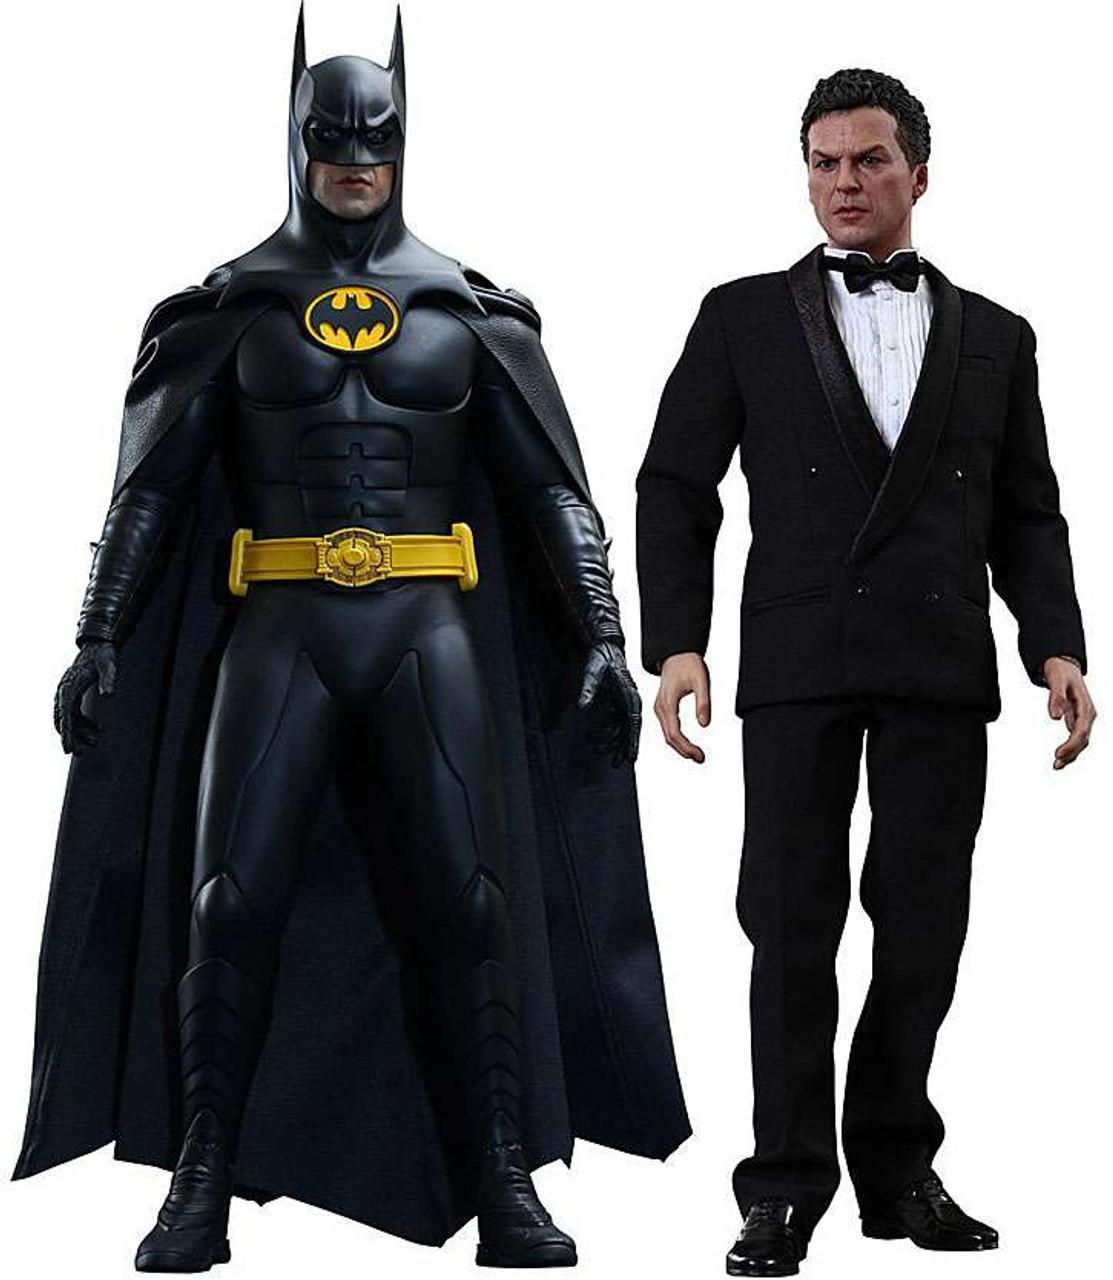 Batman Returns Movie Masterpiece Deluxe Batman & Bruce Wayne 1/6 Collectible Figure [Batman Returns]